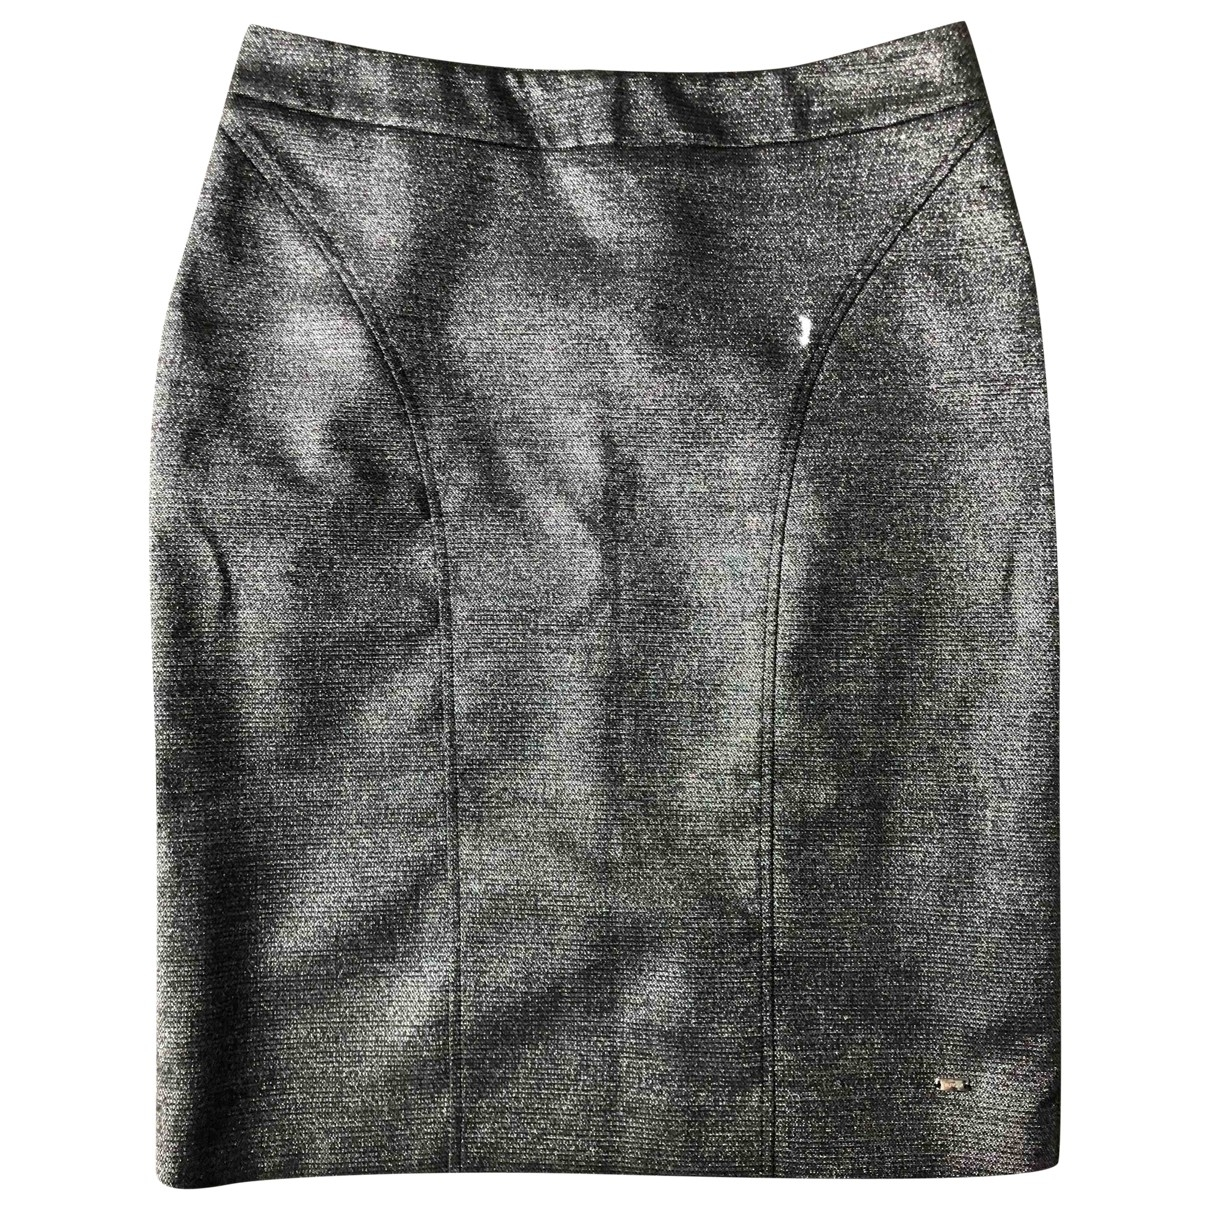 Tommy Hilfiger \N Grey skirt for Women M International